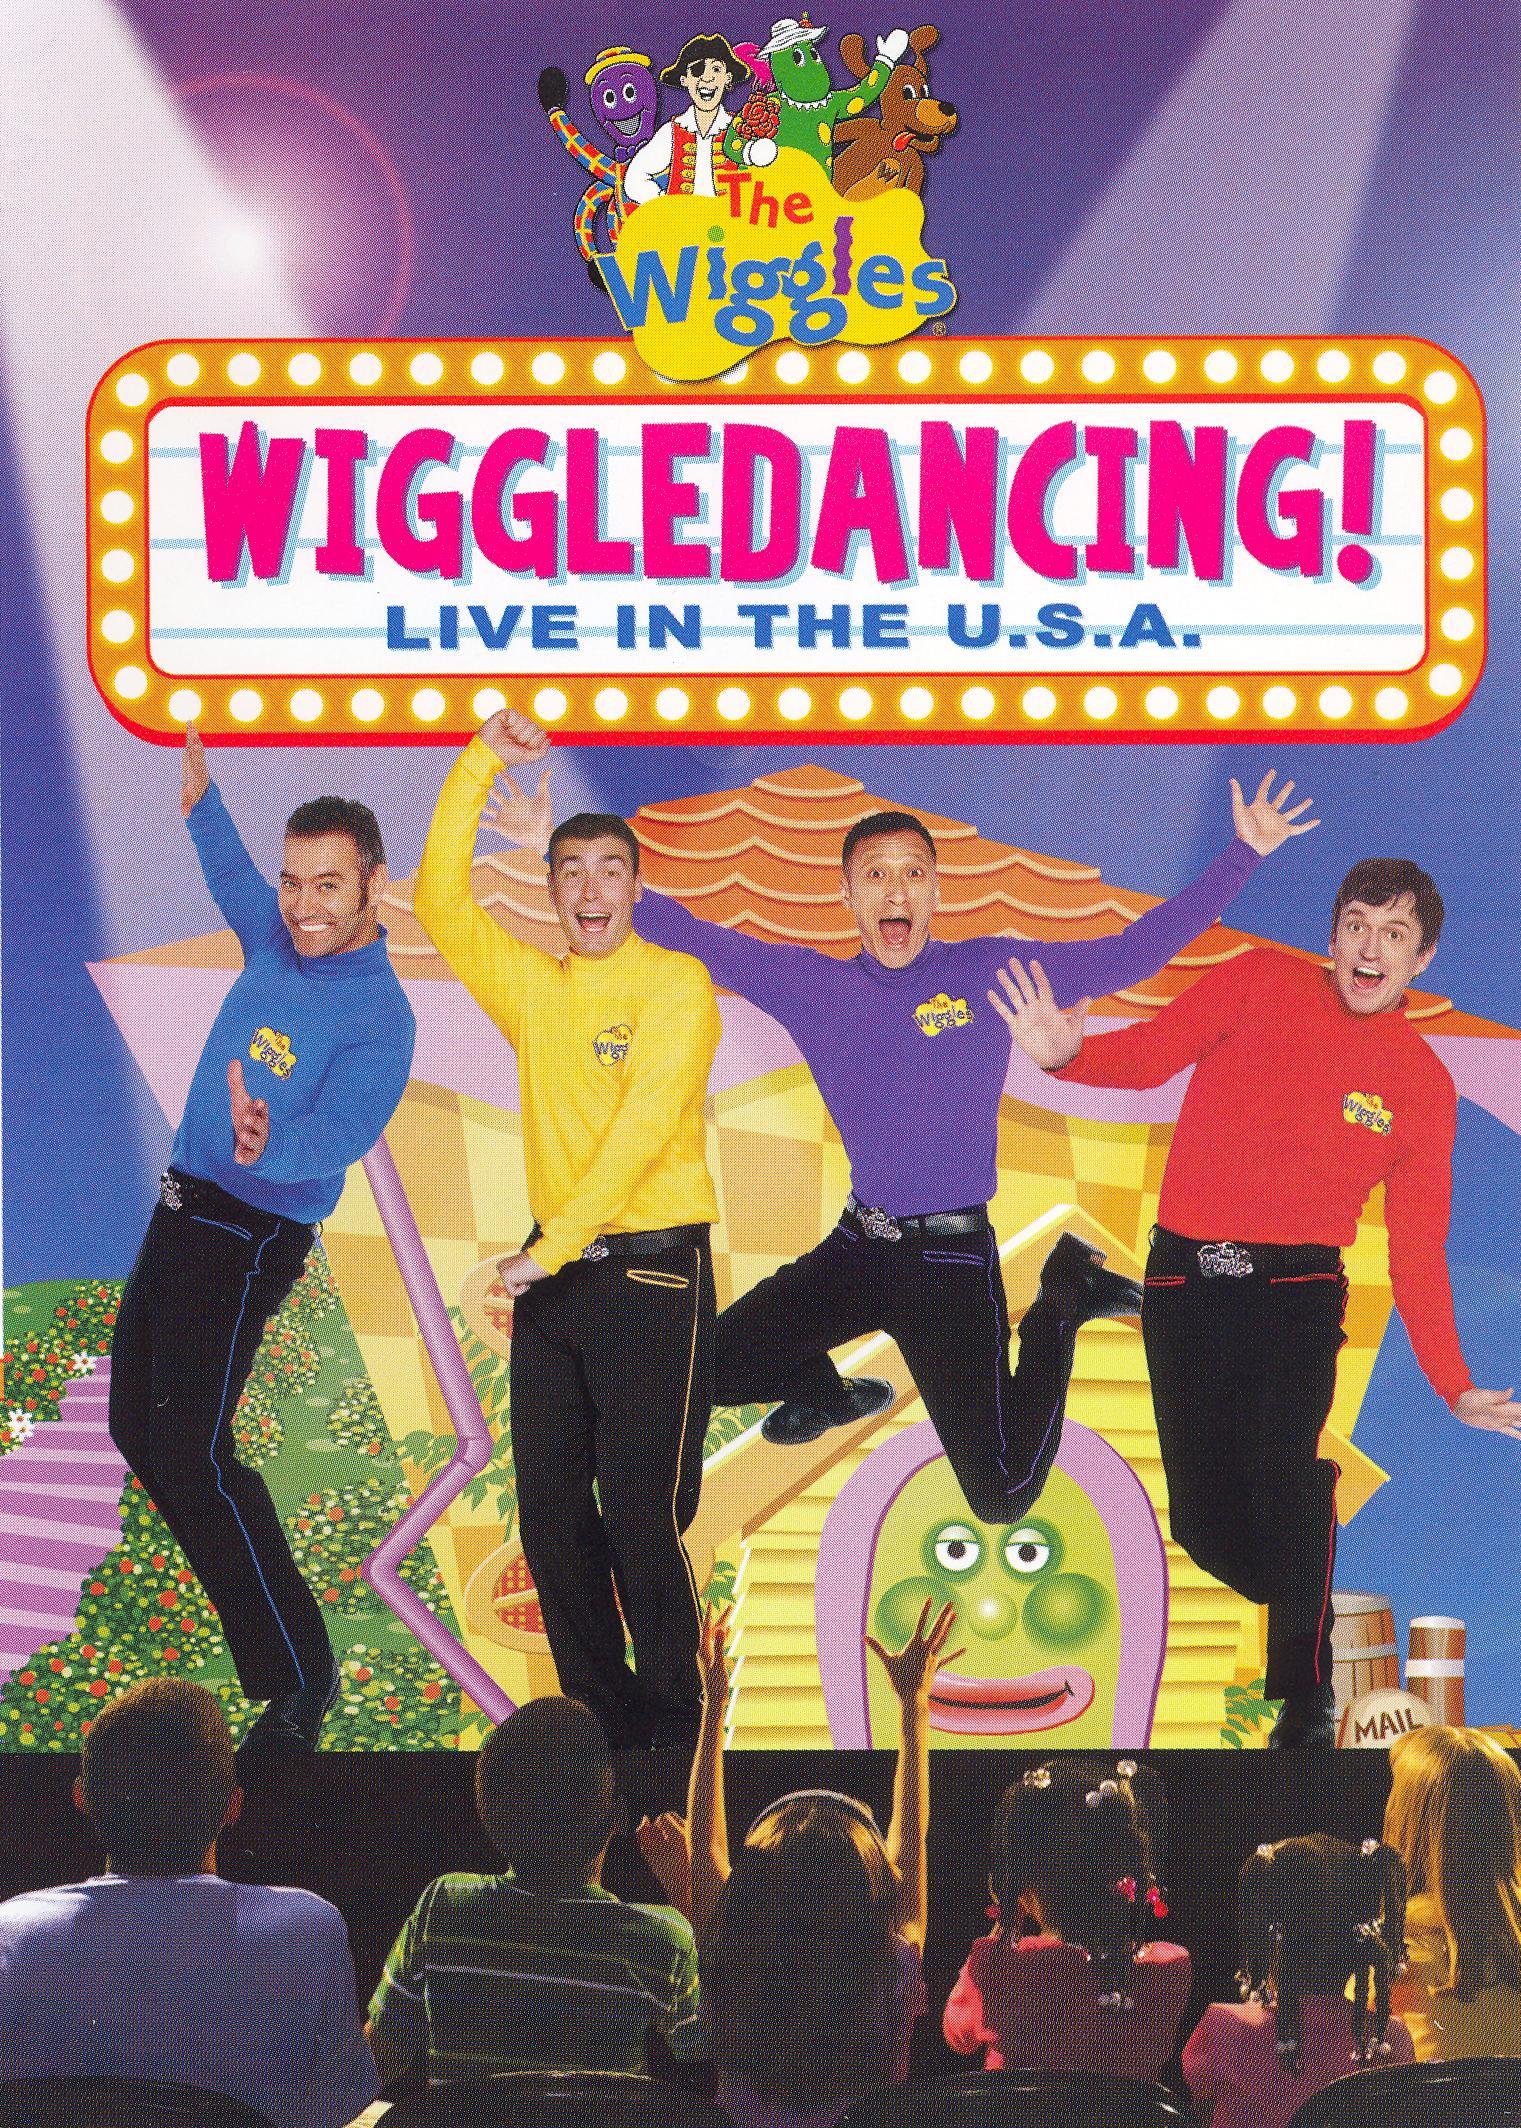 The Wiggles: Wiggledancing! Live in the U.S.A.